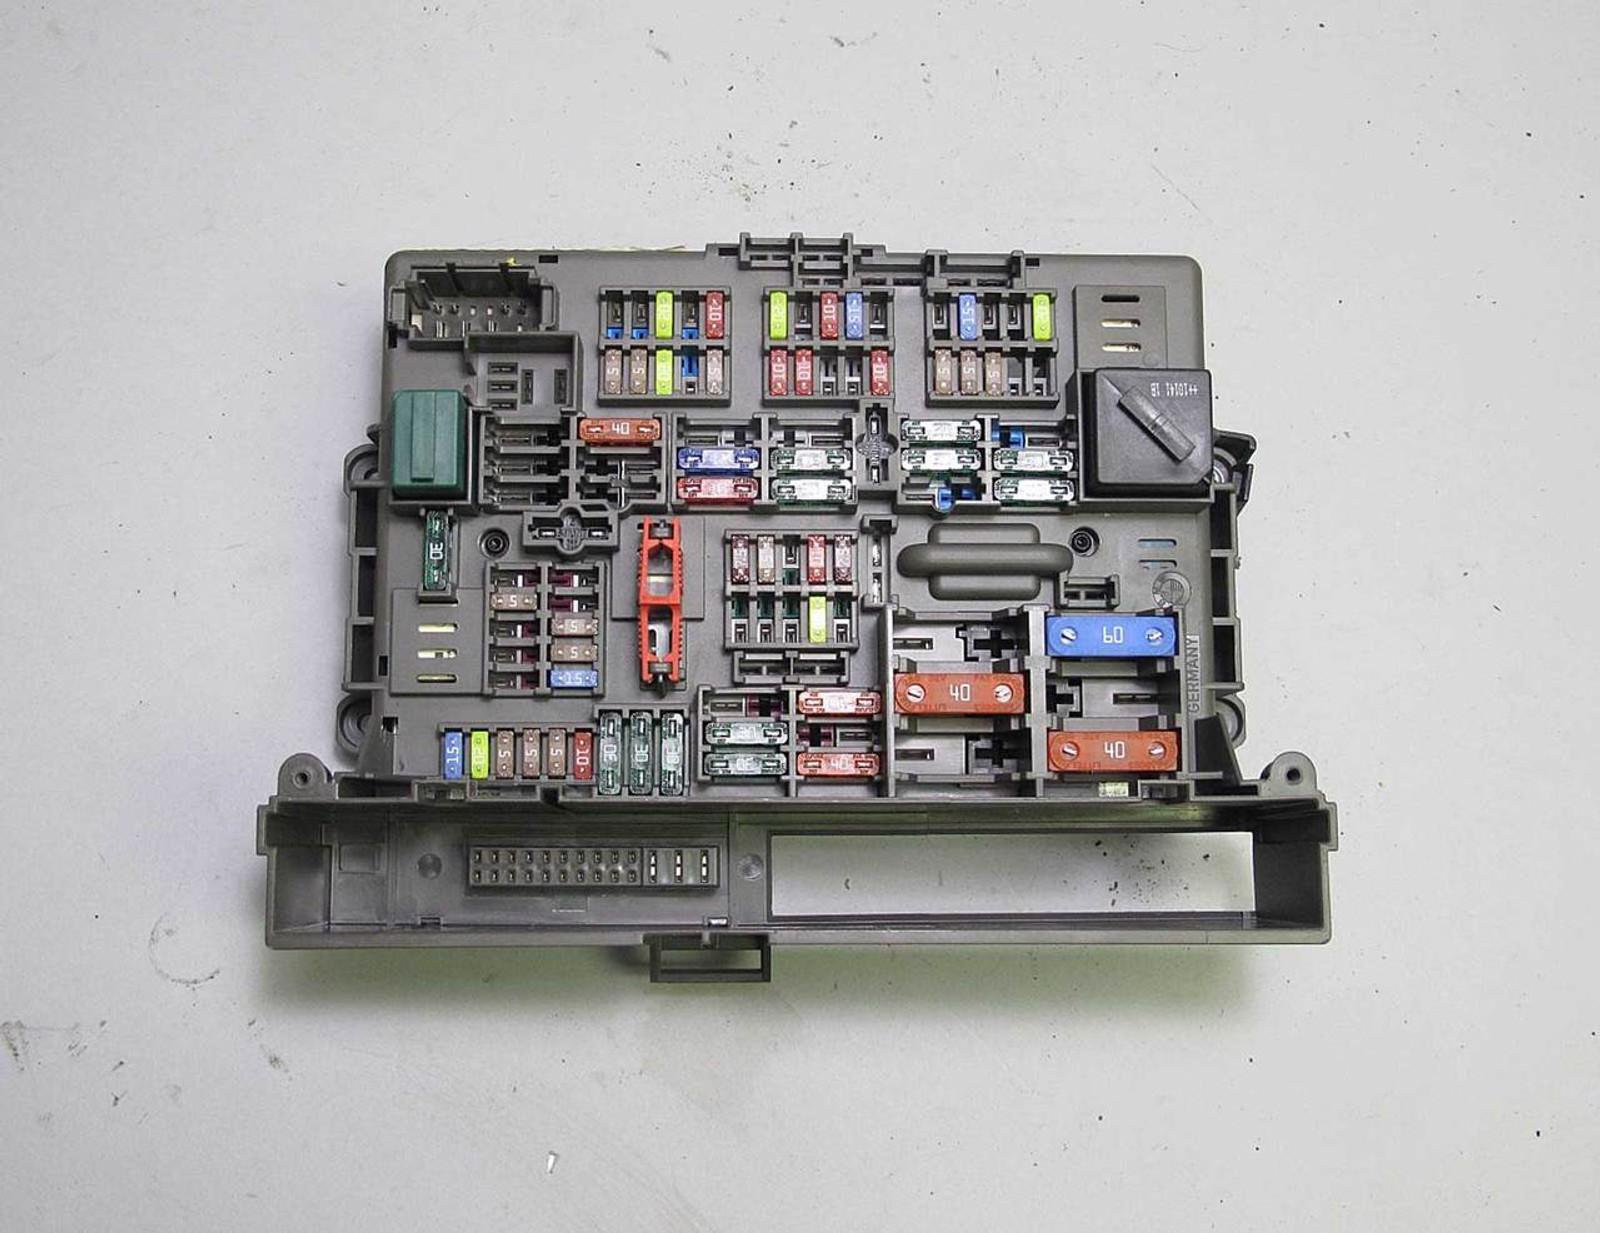 bmw e90 fuse box recall wiring diagram dat bmw 1 series recall fuse box bmw fuse box recall [ 1600 x 1233 Pixel ]